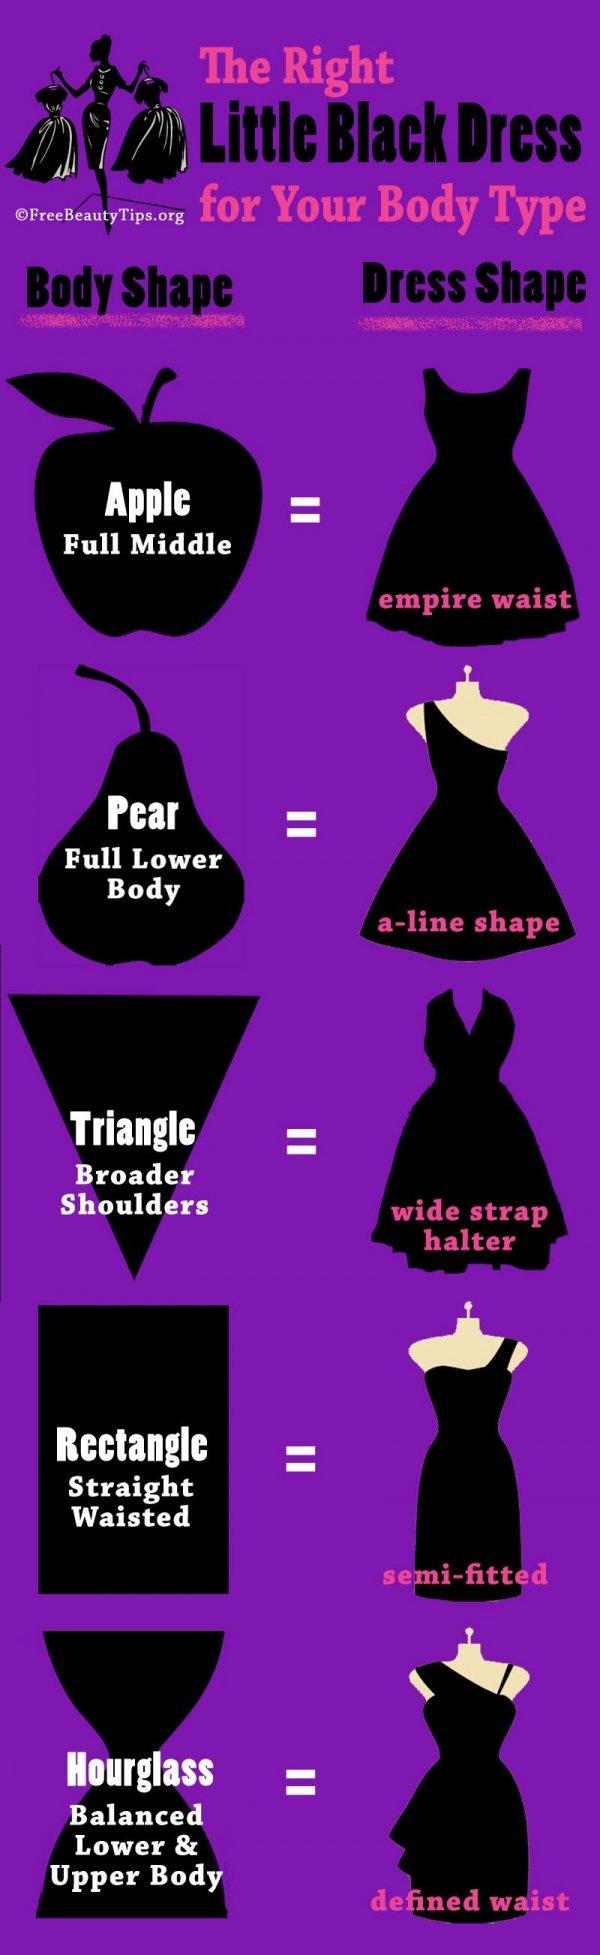 Little Black Dress Shapes by Body Type